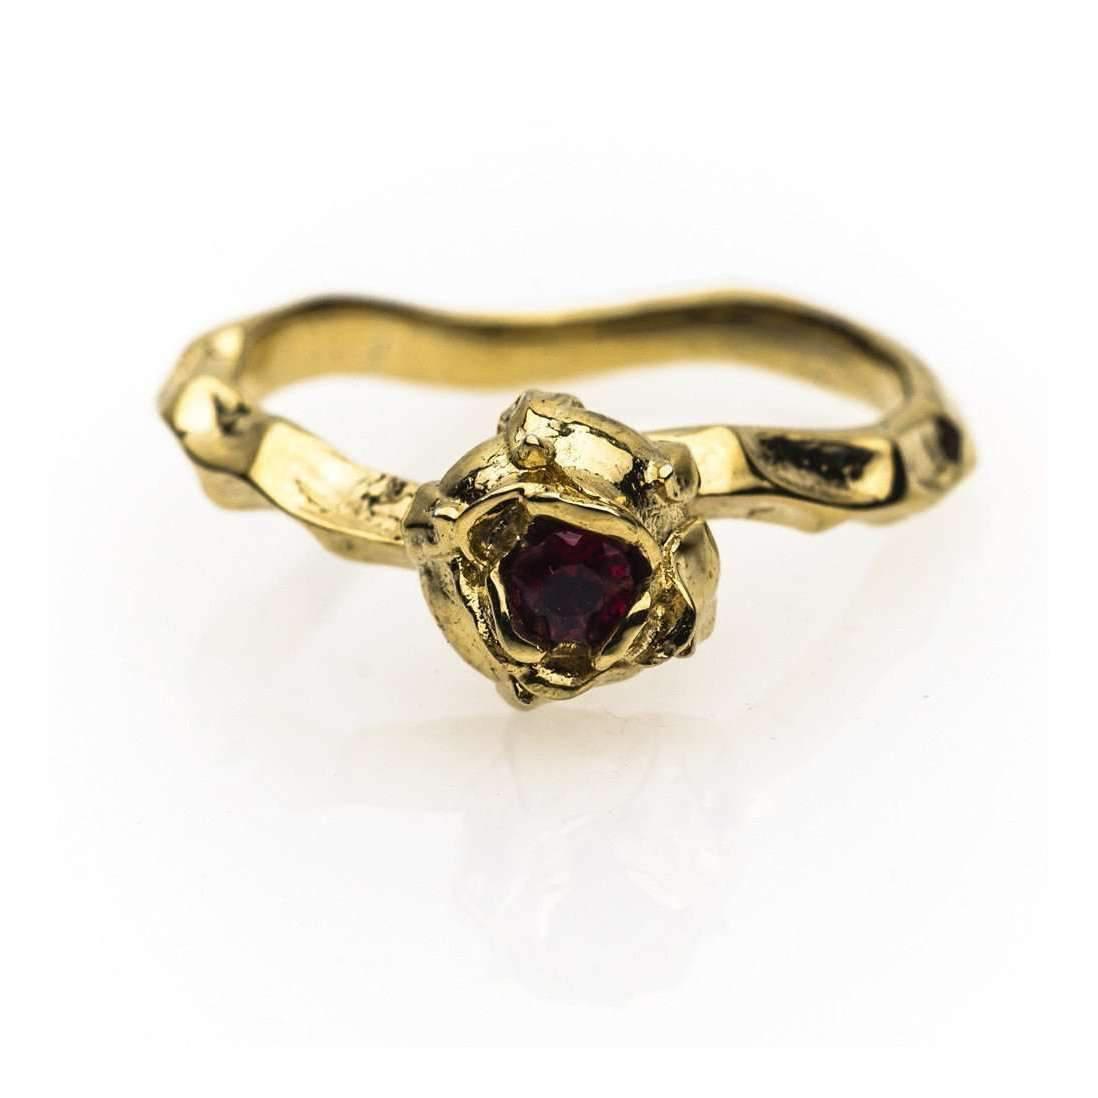 Shakti Ellenwood Trinity 18kt Fairtrade Gold and Diamond Rings - UK U - US 10 1/4 - EU 62 3/4 - White ZBjDn8